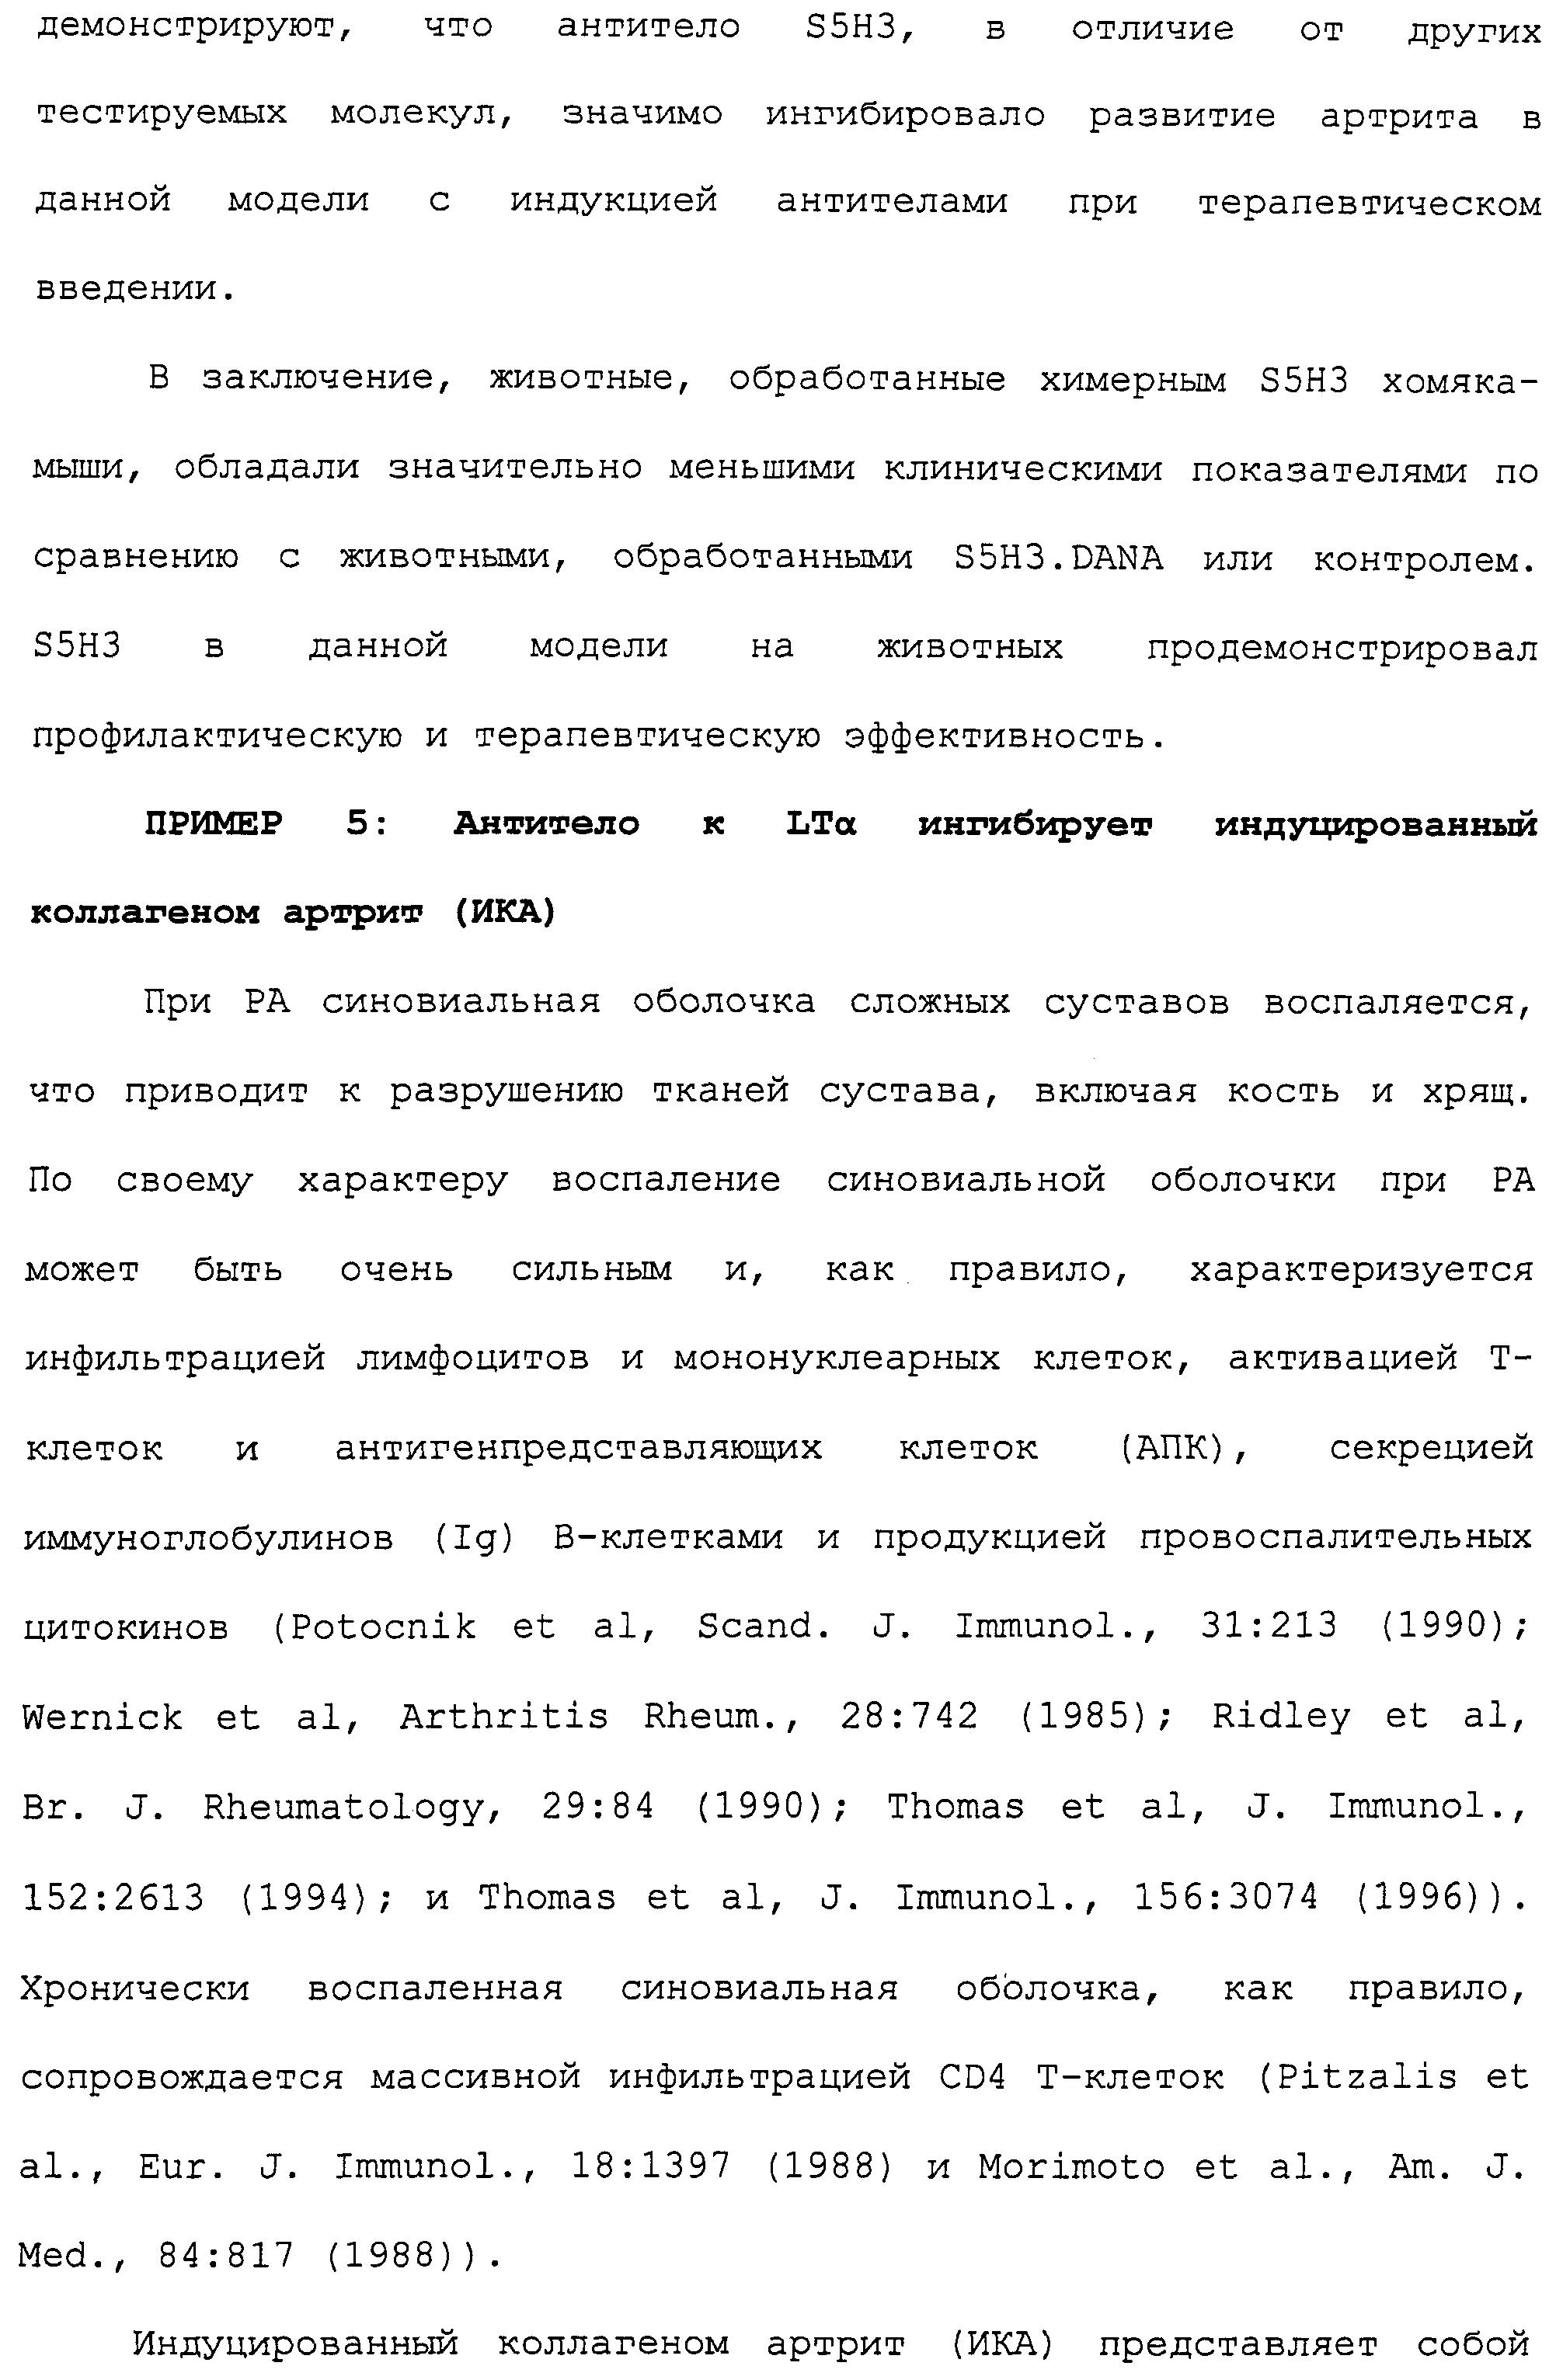 Figure 00000254